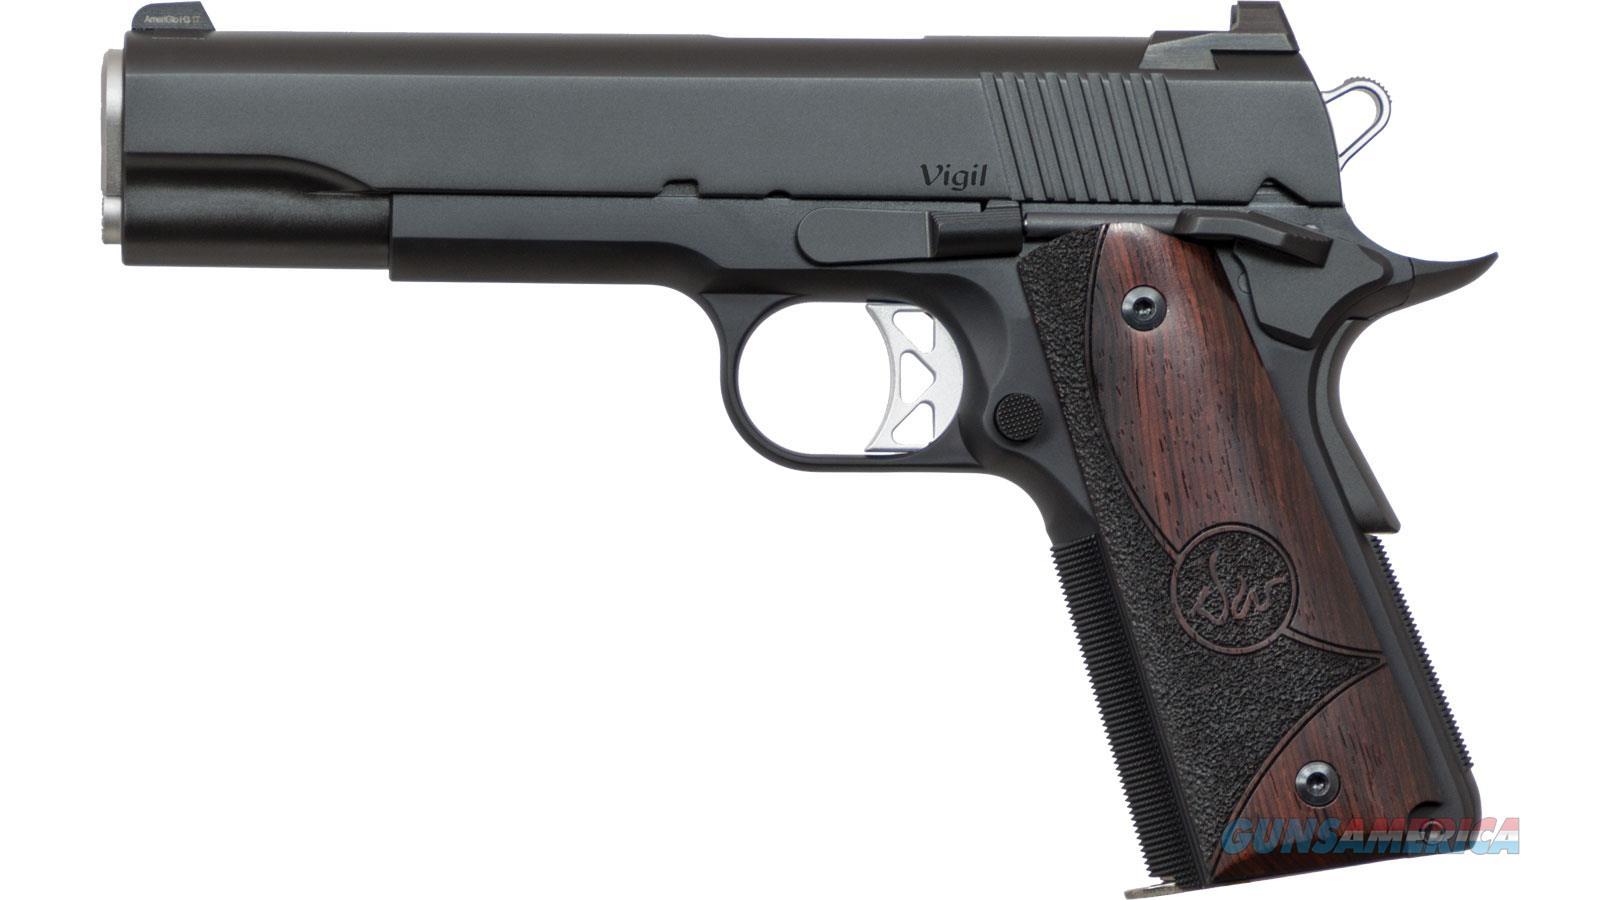 Dan Wesson Dw Vigil 9Mm Blk Al Frame 01833  Guns > Pistols > C Misc Pistols